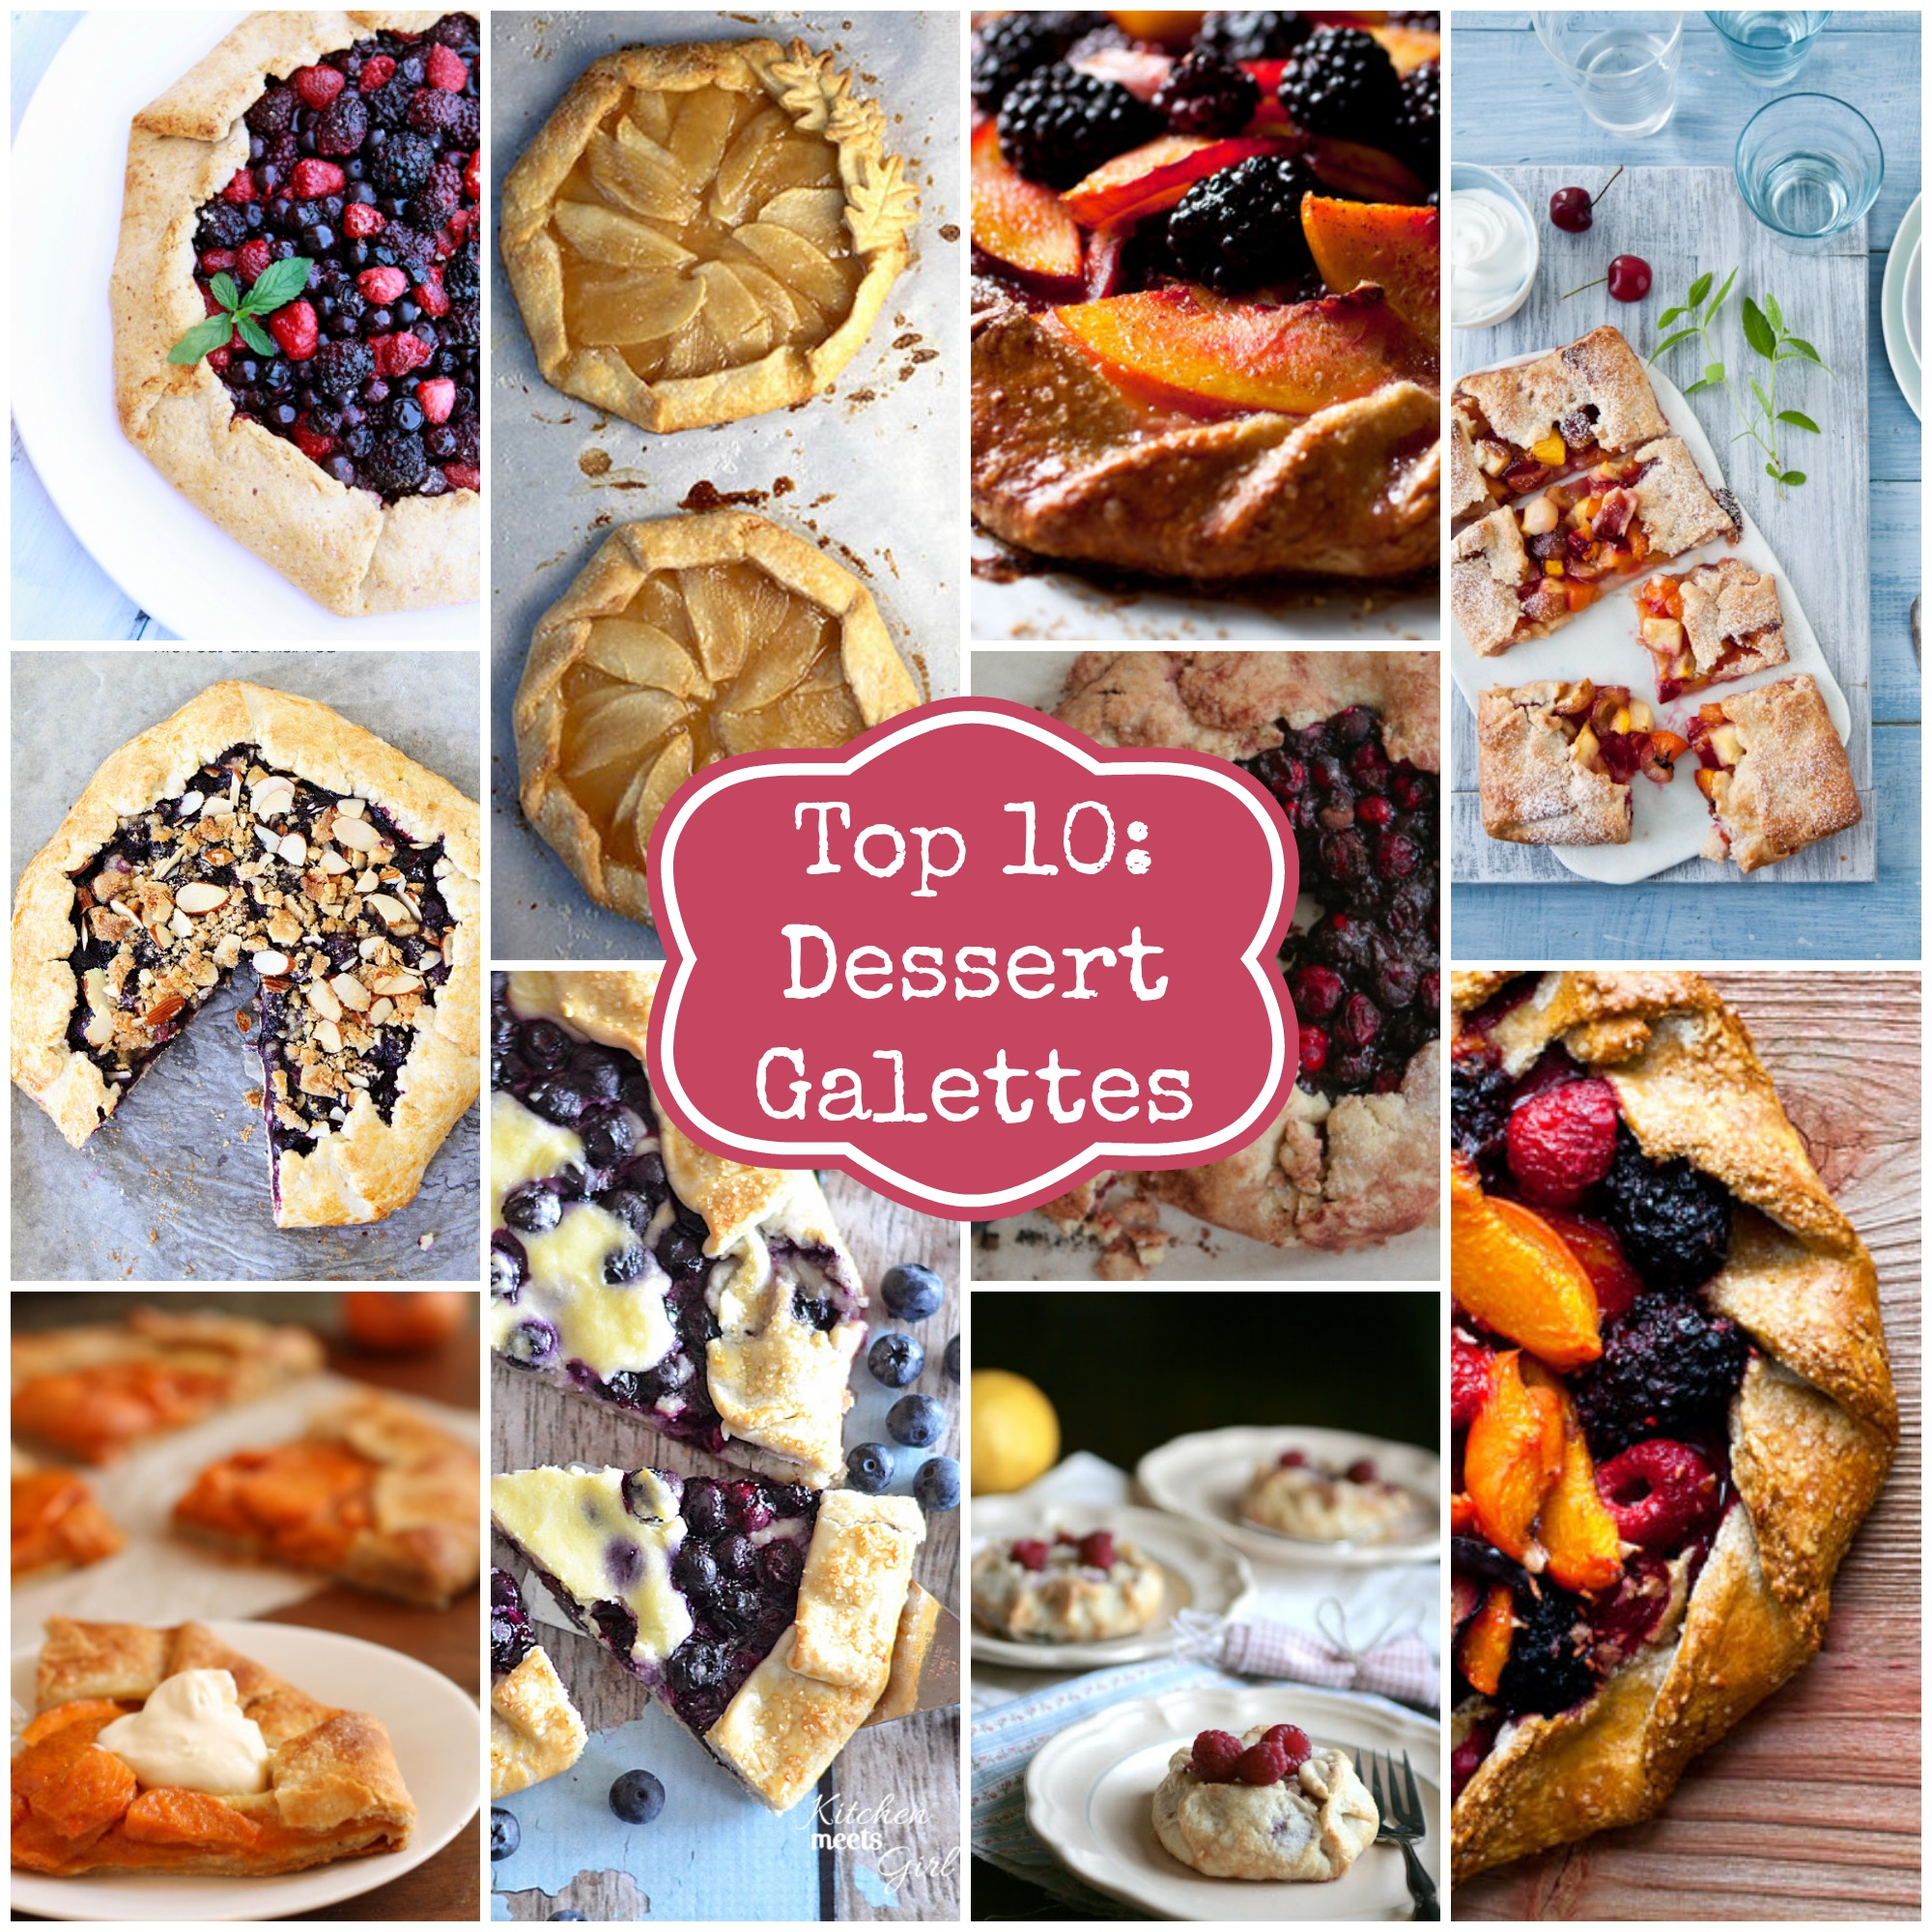 Top 10 Dessert Galettes.jpg